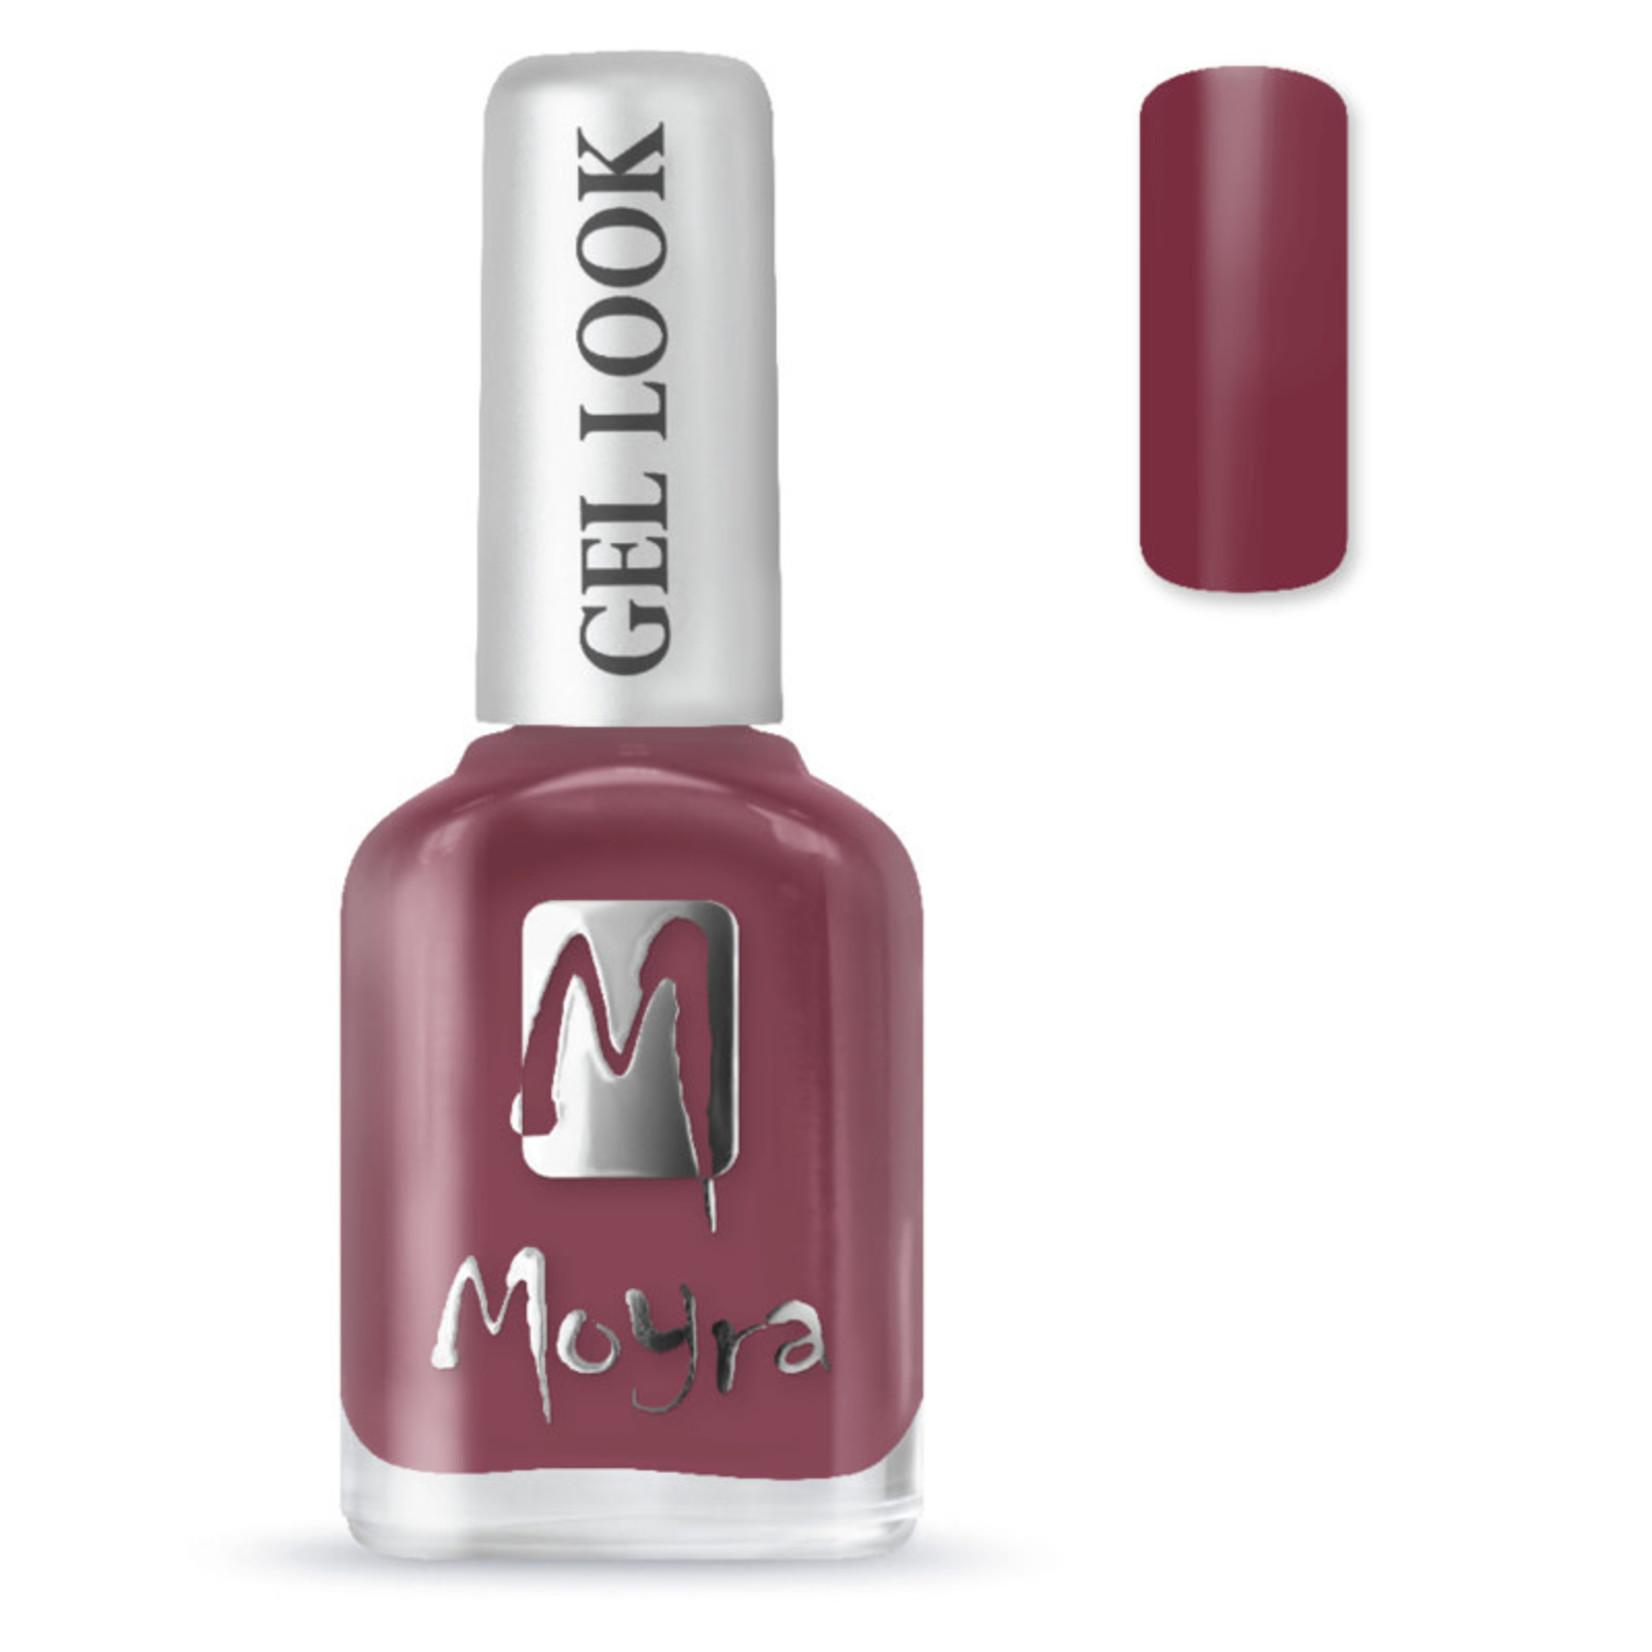 Moyra Moyra Gel Look nail polish 926 Odette